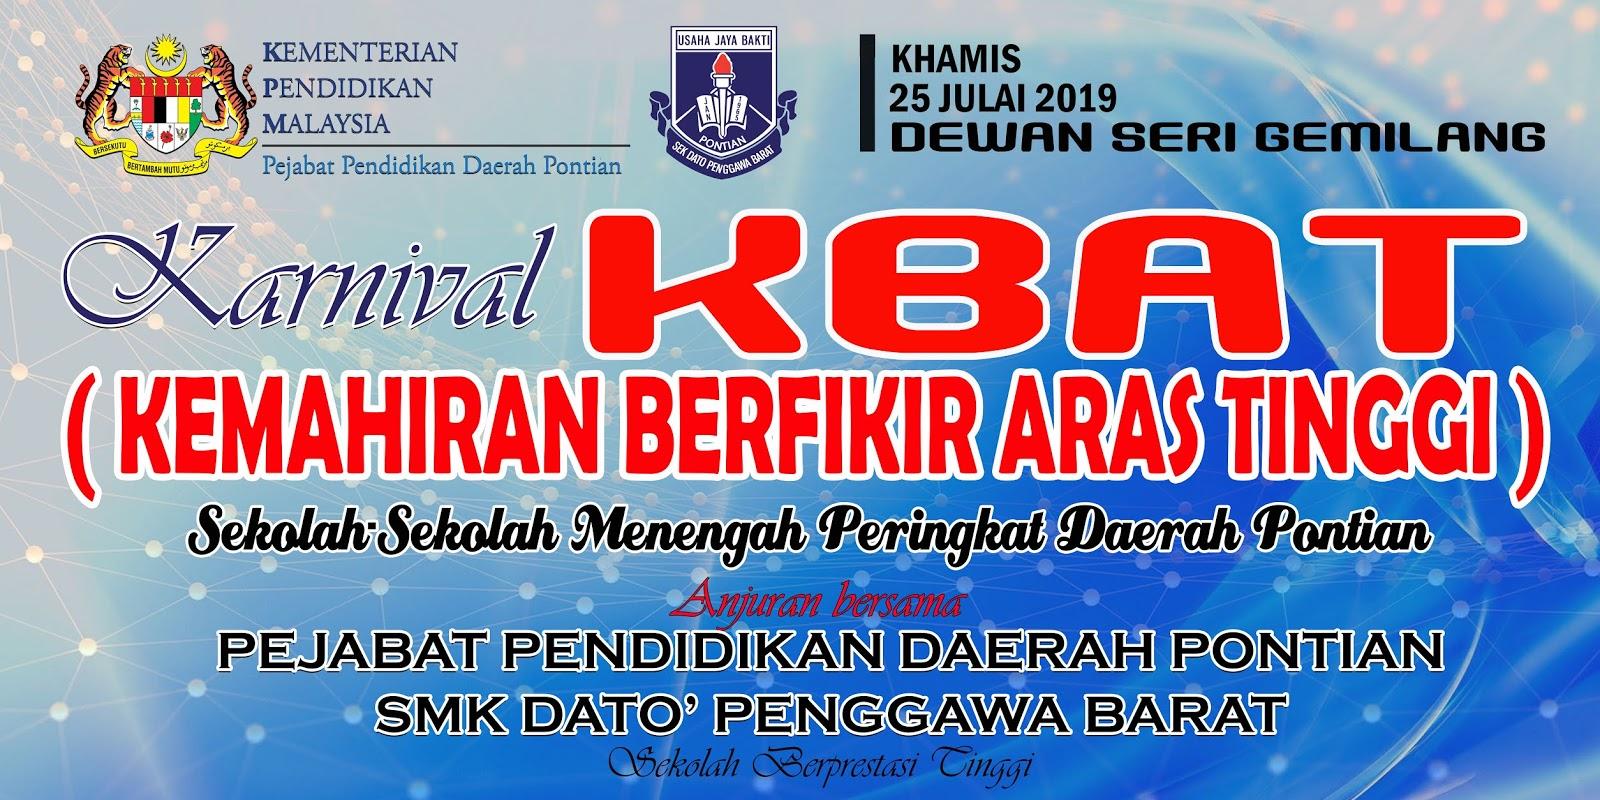 Smkdpb Karnival Kbat Daerah Pontian 2019